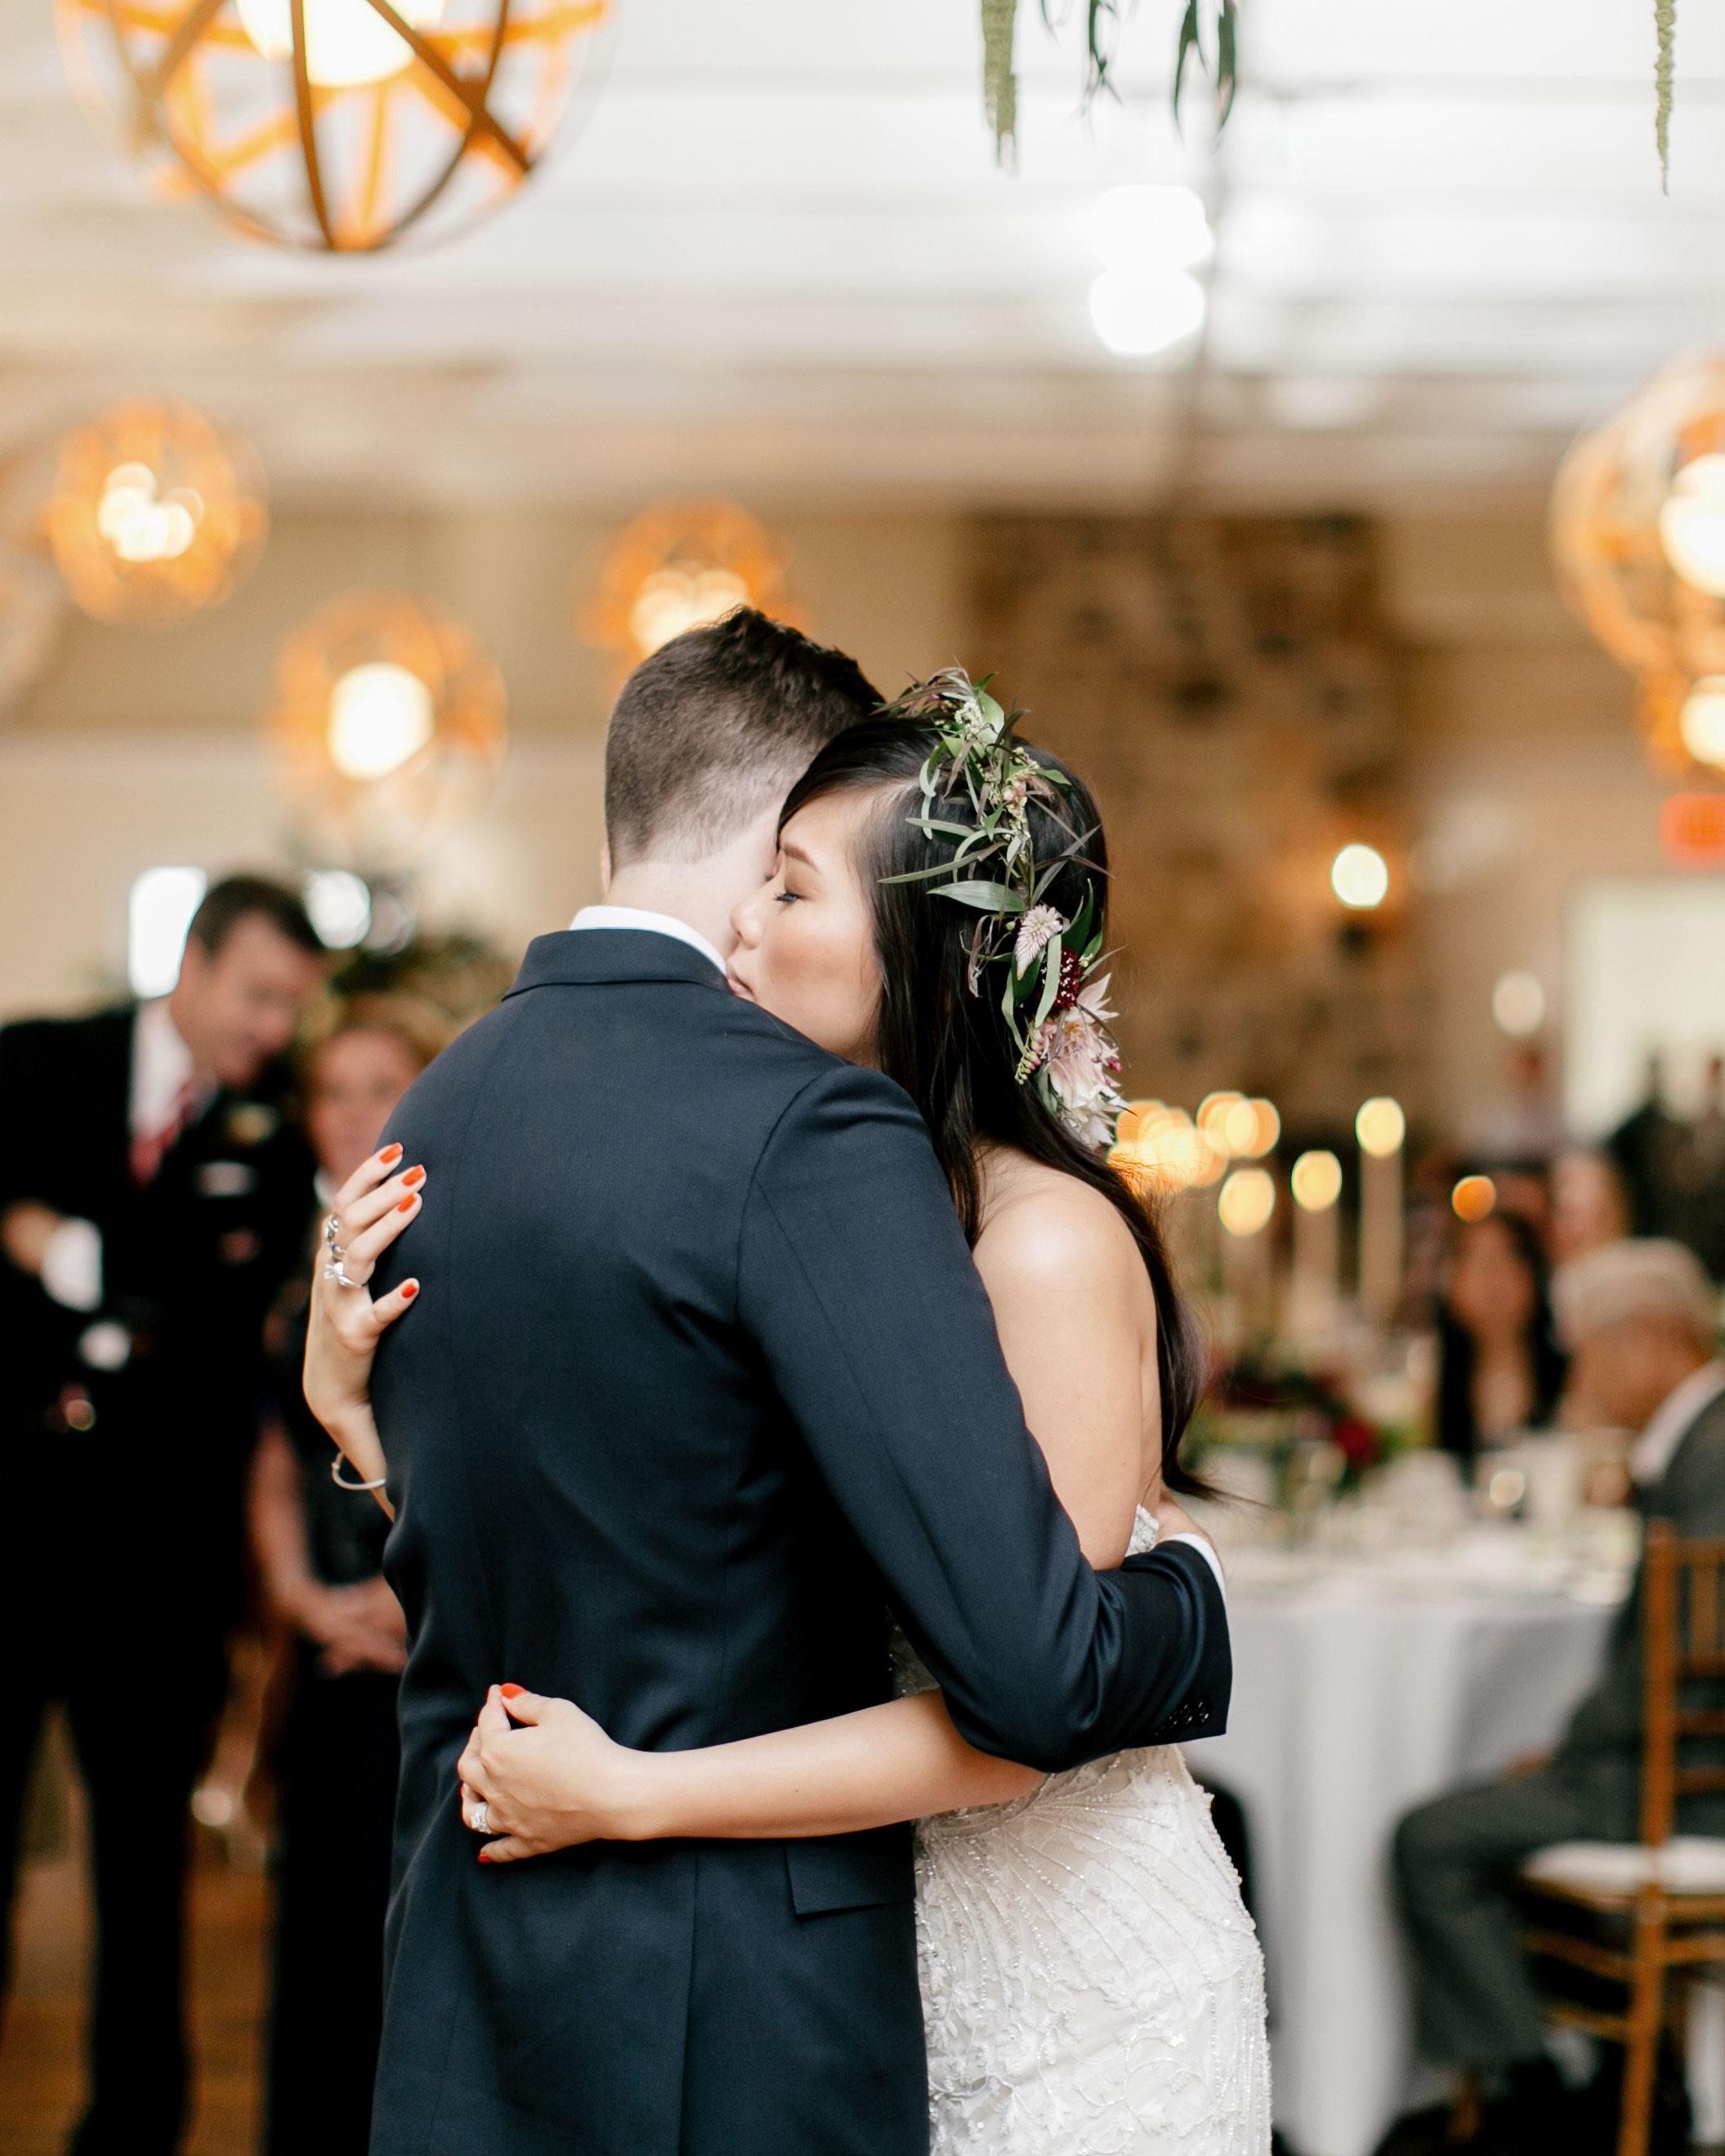 susan-tom-wedding-firstdance-258-s112692-0316.jpg